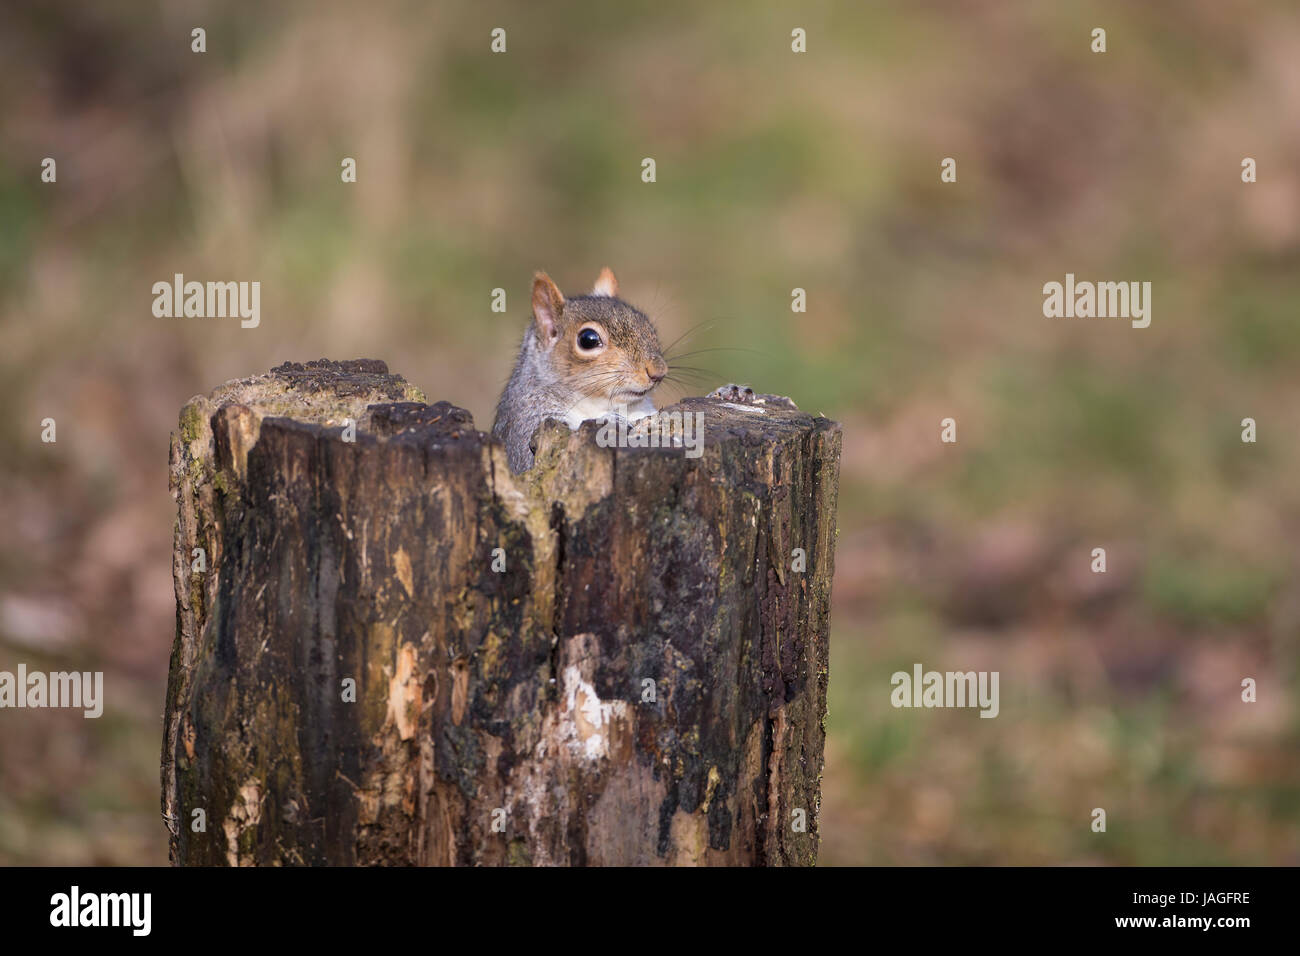 Gris ardilla Sciurus carolinensis peeping desde detrás de un tocón de árbol Imagen De Stock